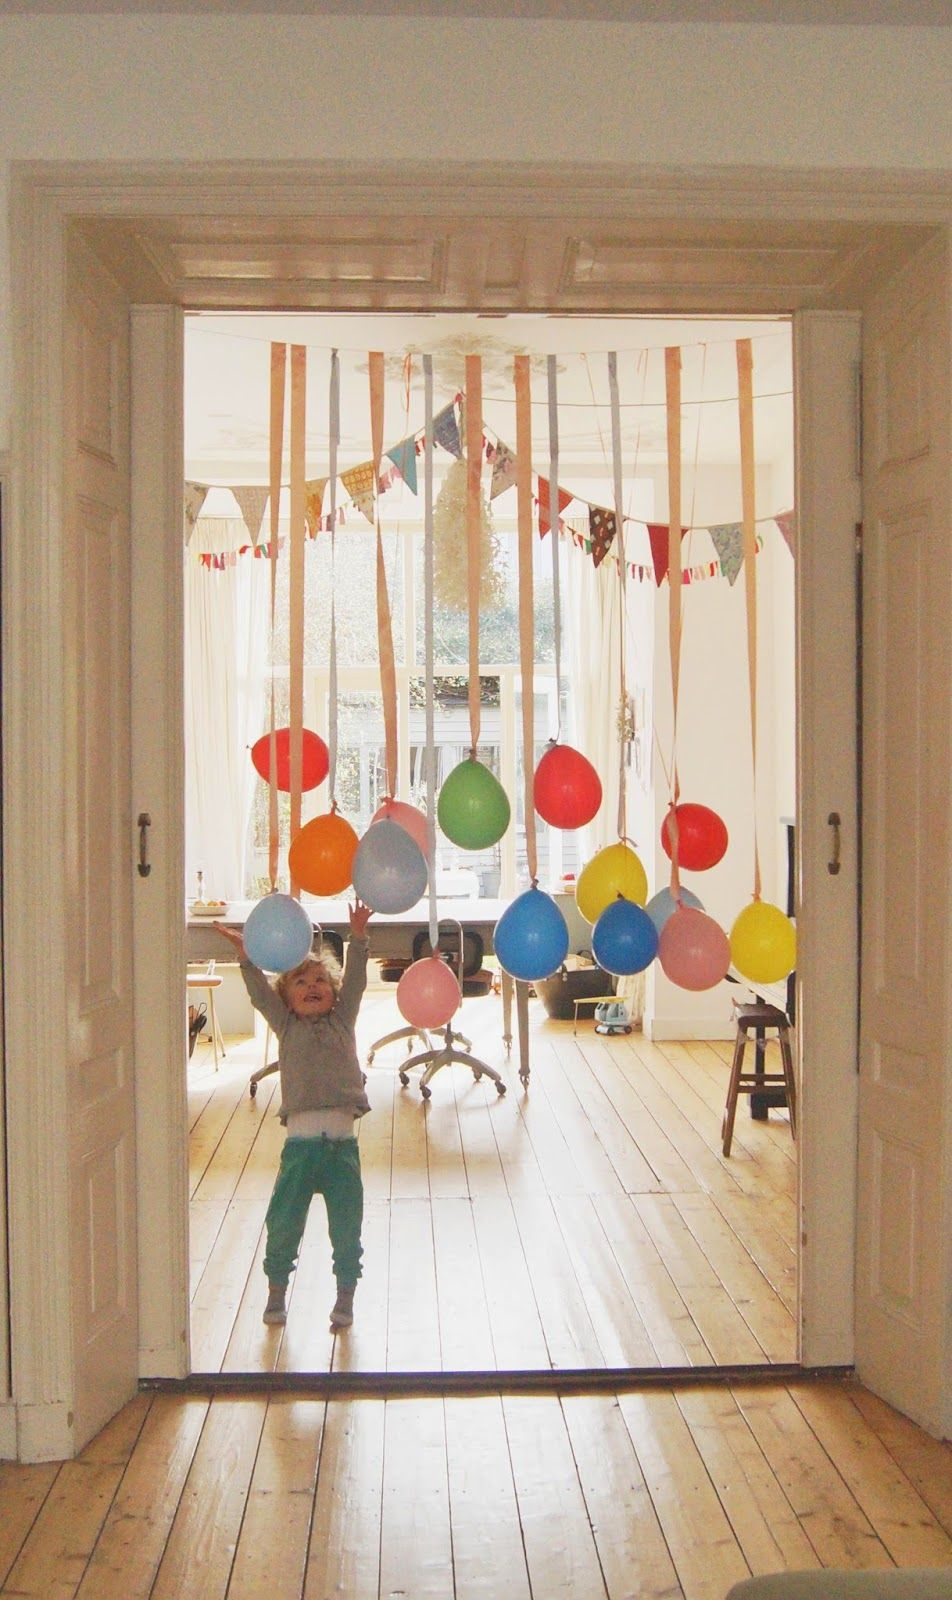 Des ballons suspendus birthday fun first parties birthdays morning surprise also saar manche bday pinterest and party rh